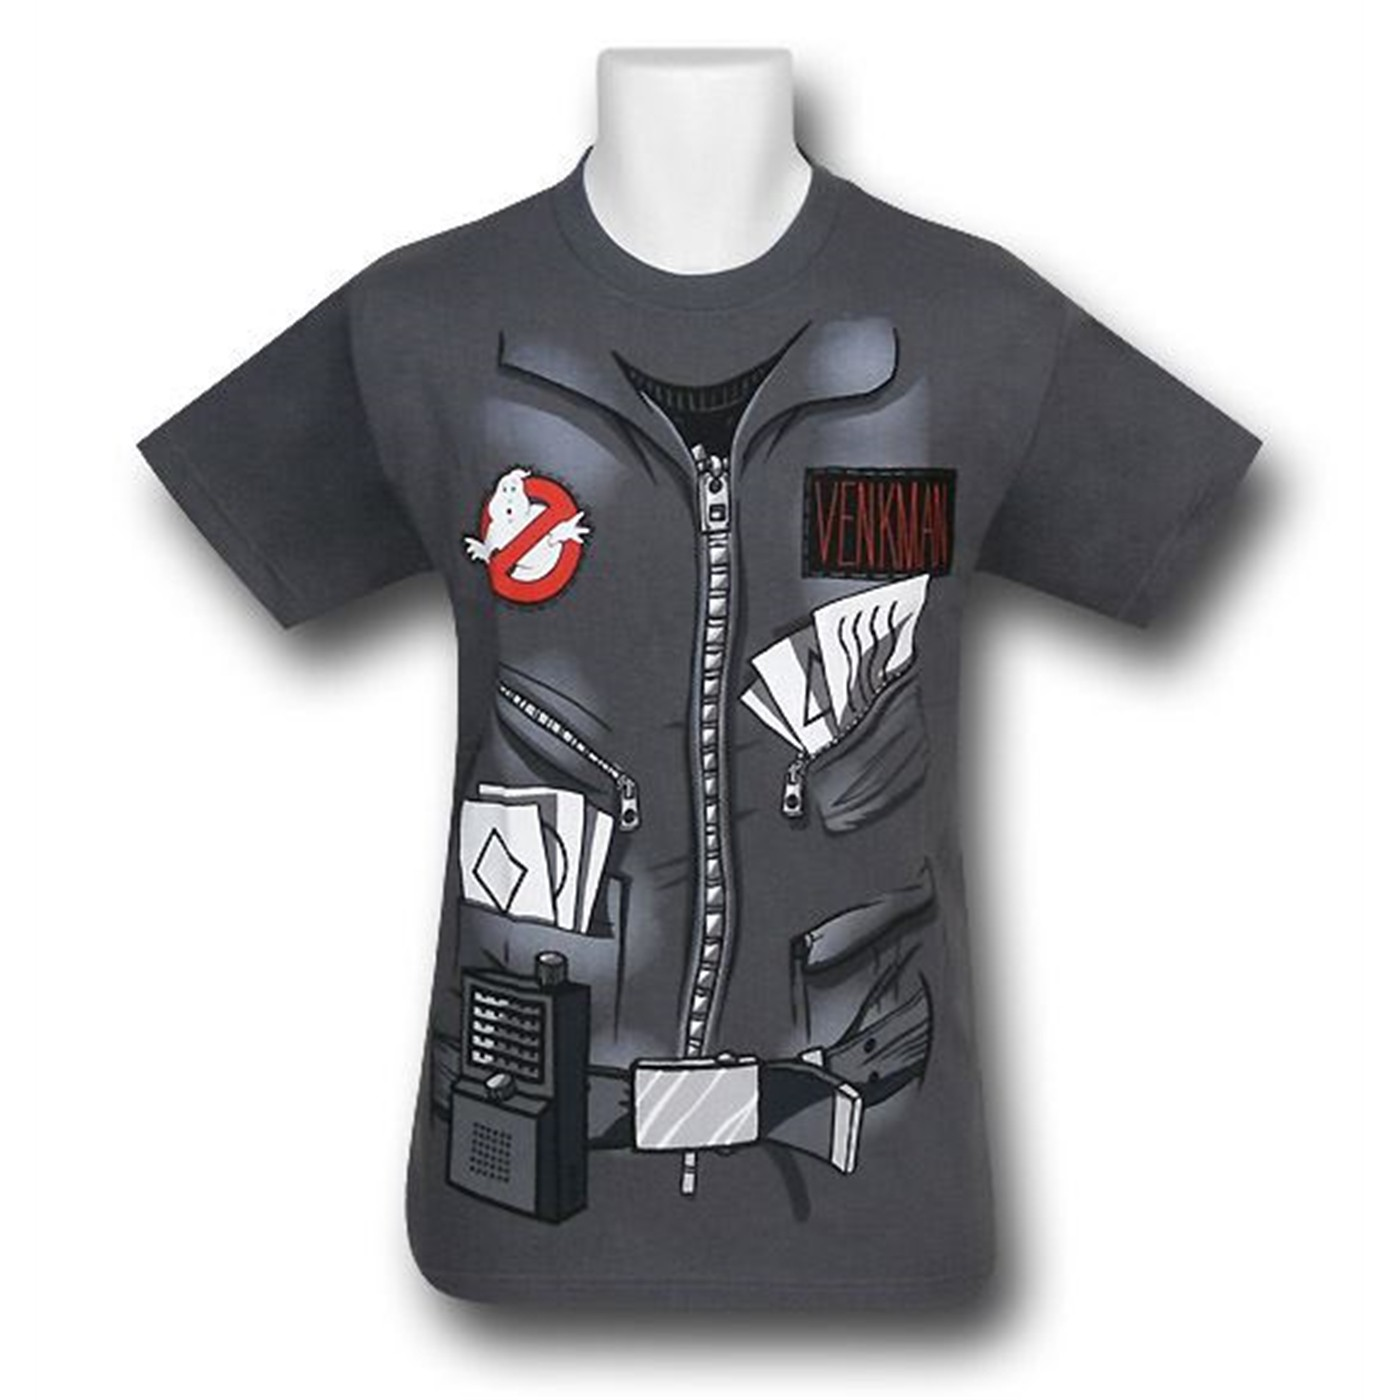 Ghostbusters Gray Venkman Costume T-Shirt